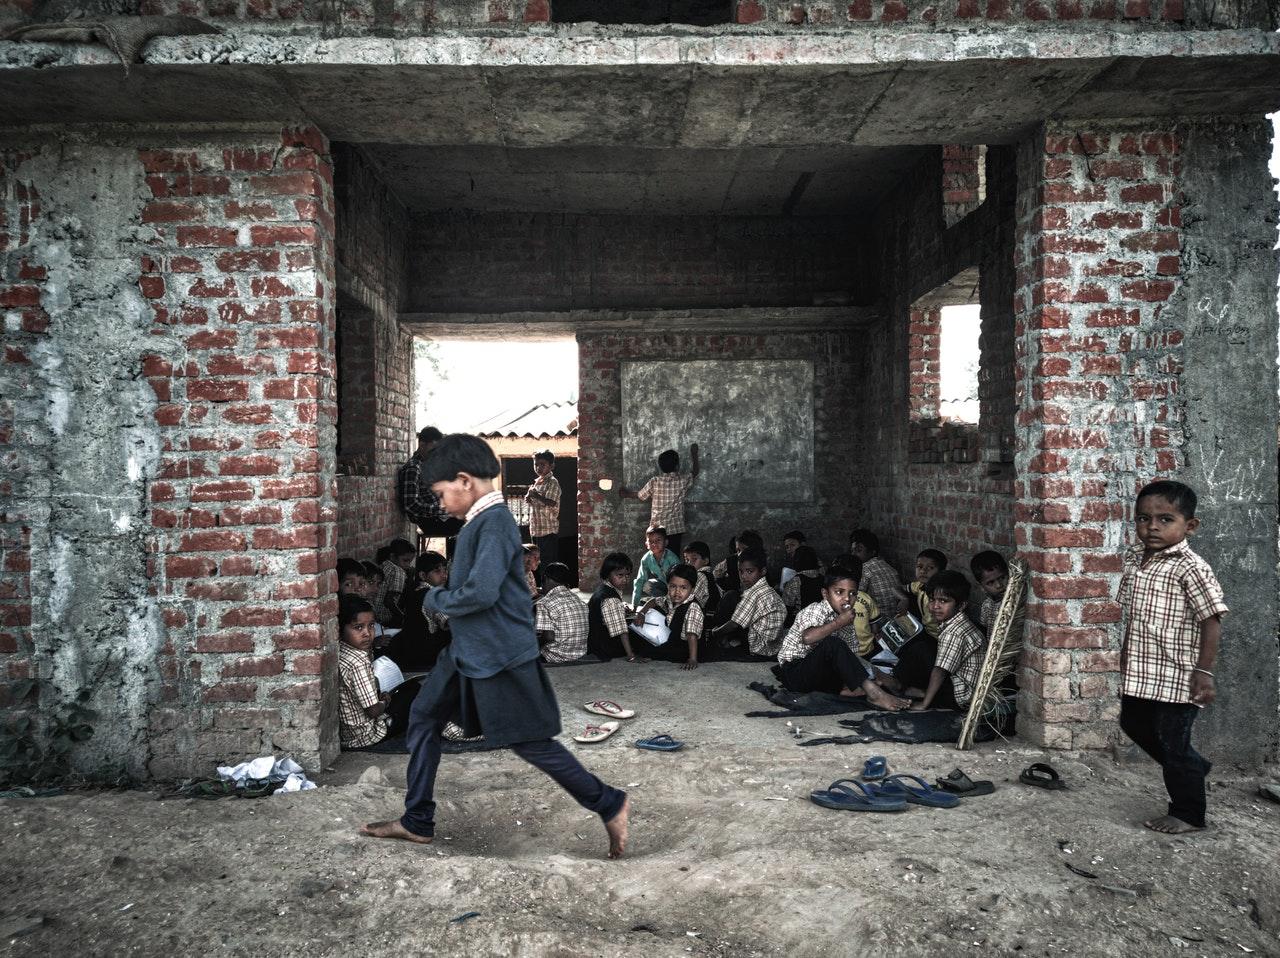 School boys, pexels licence, pic by kavya kodiya